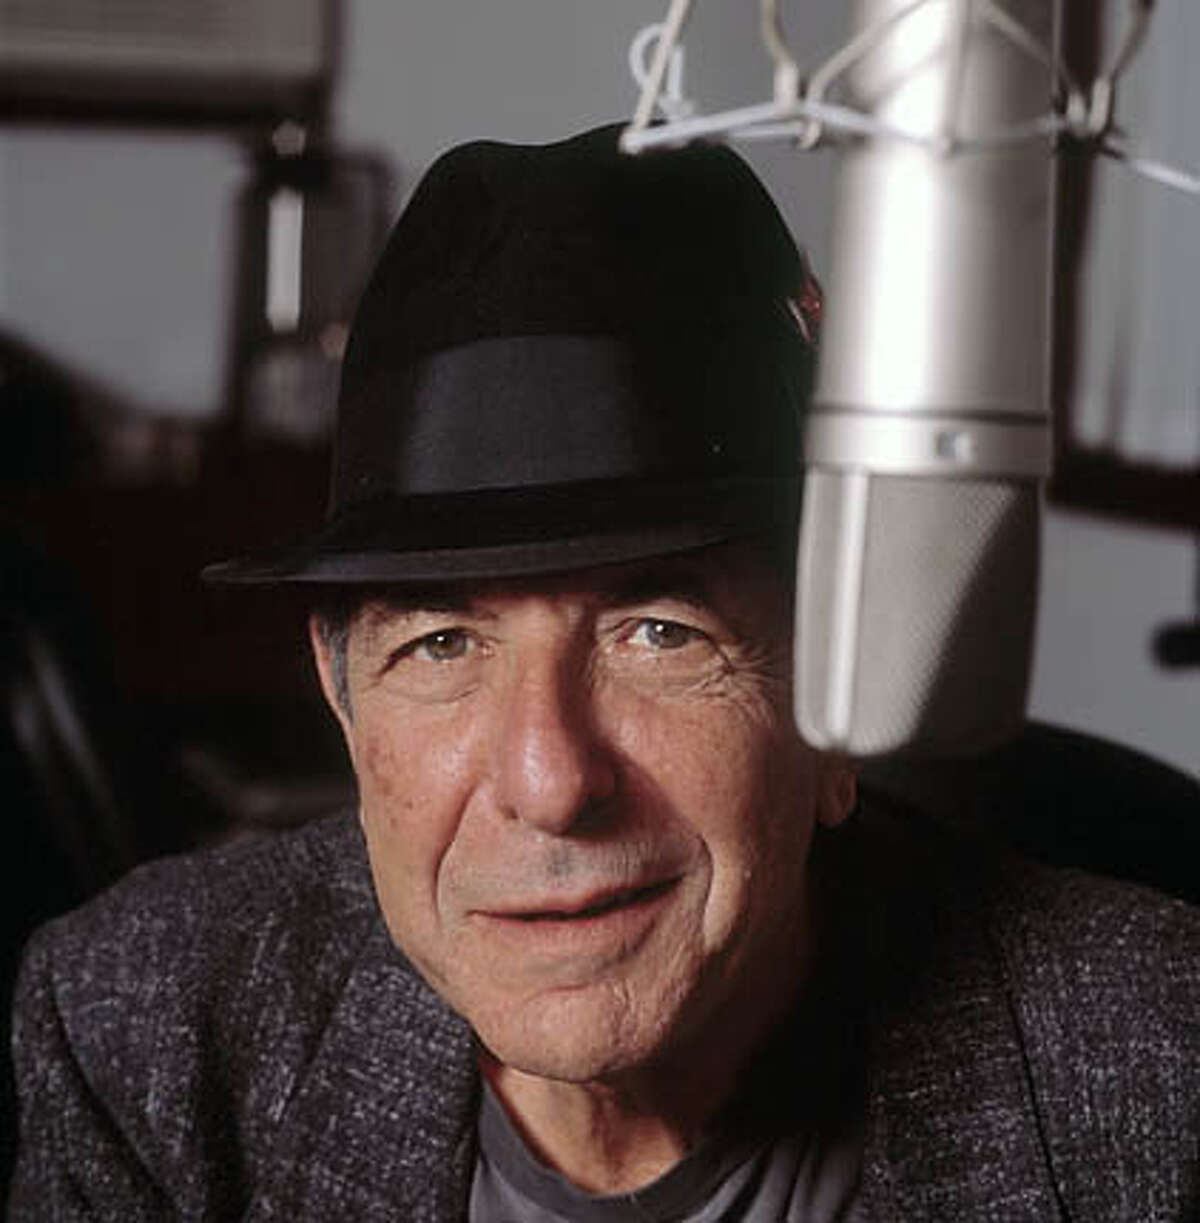 Leonard Cohen. Photo, 2001, by Matt Brown, for the Chronicle